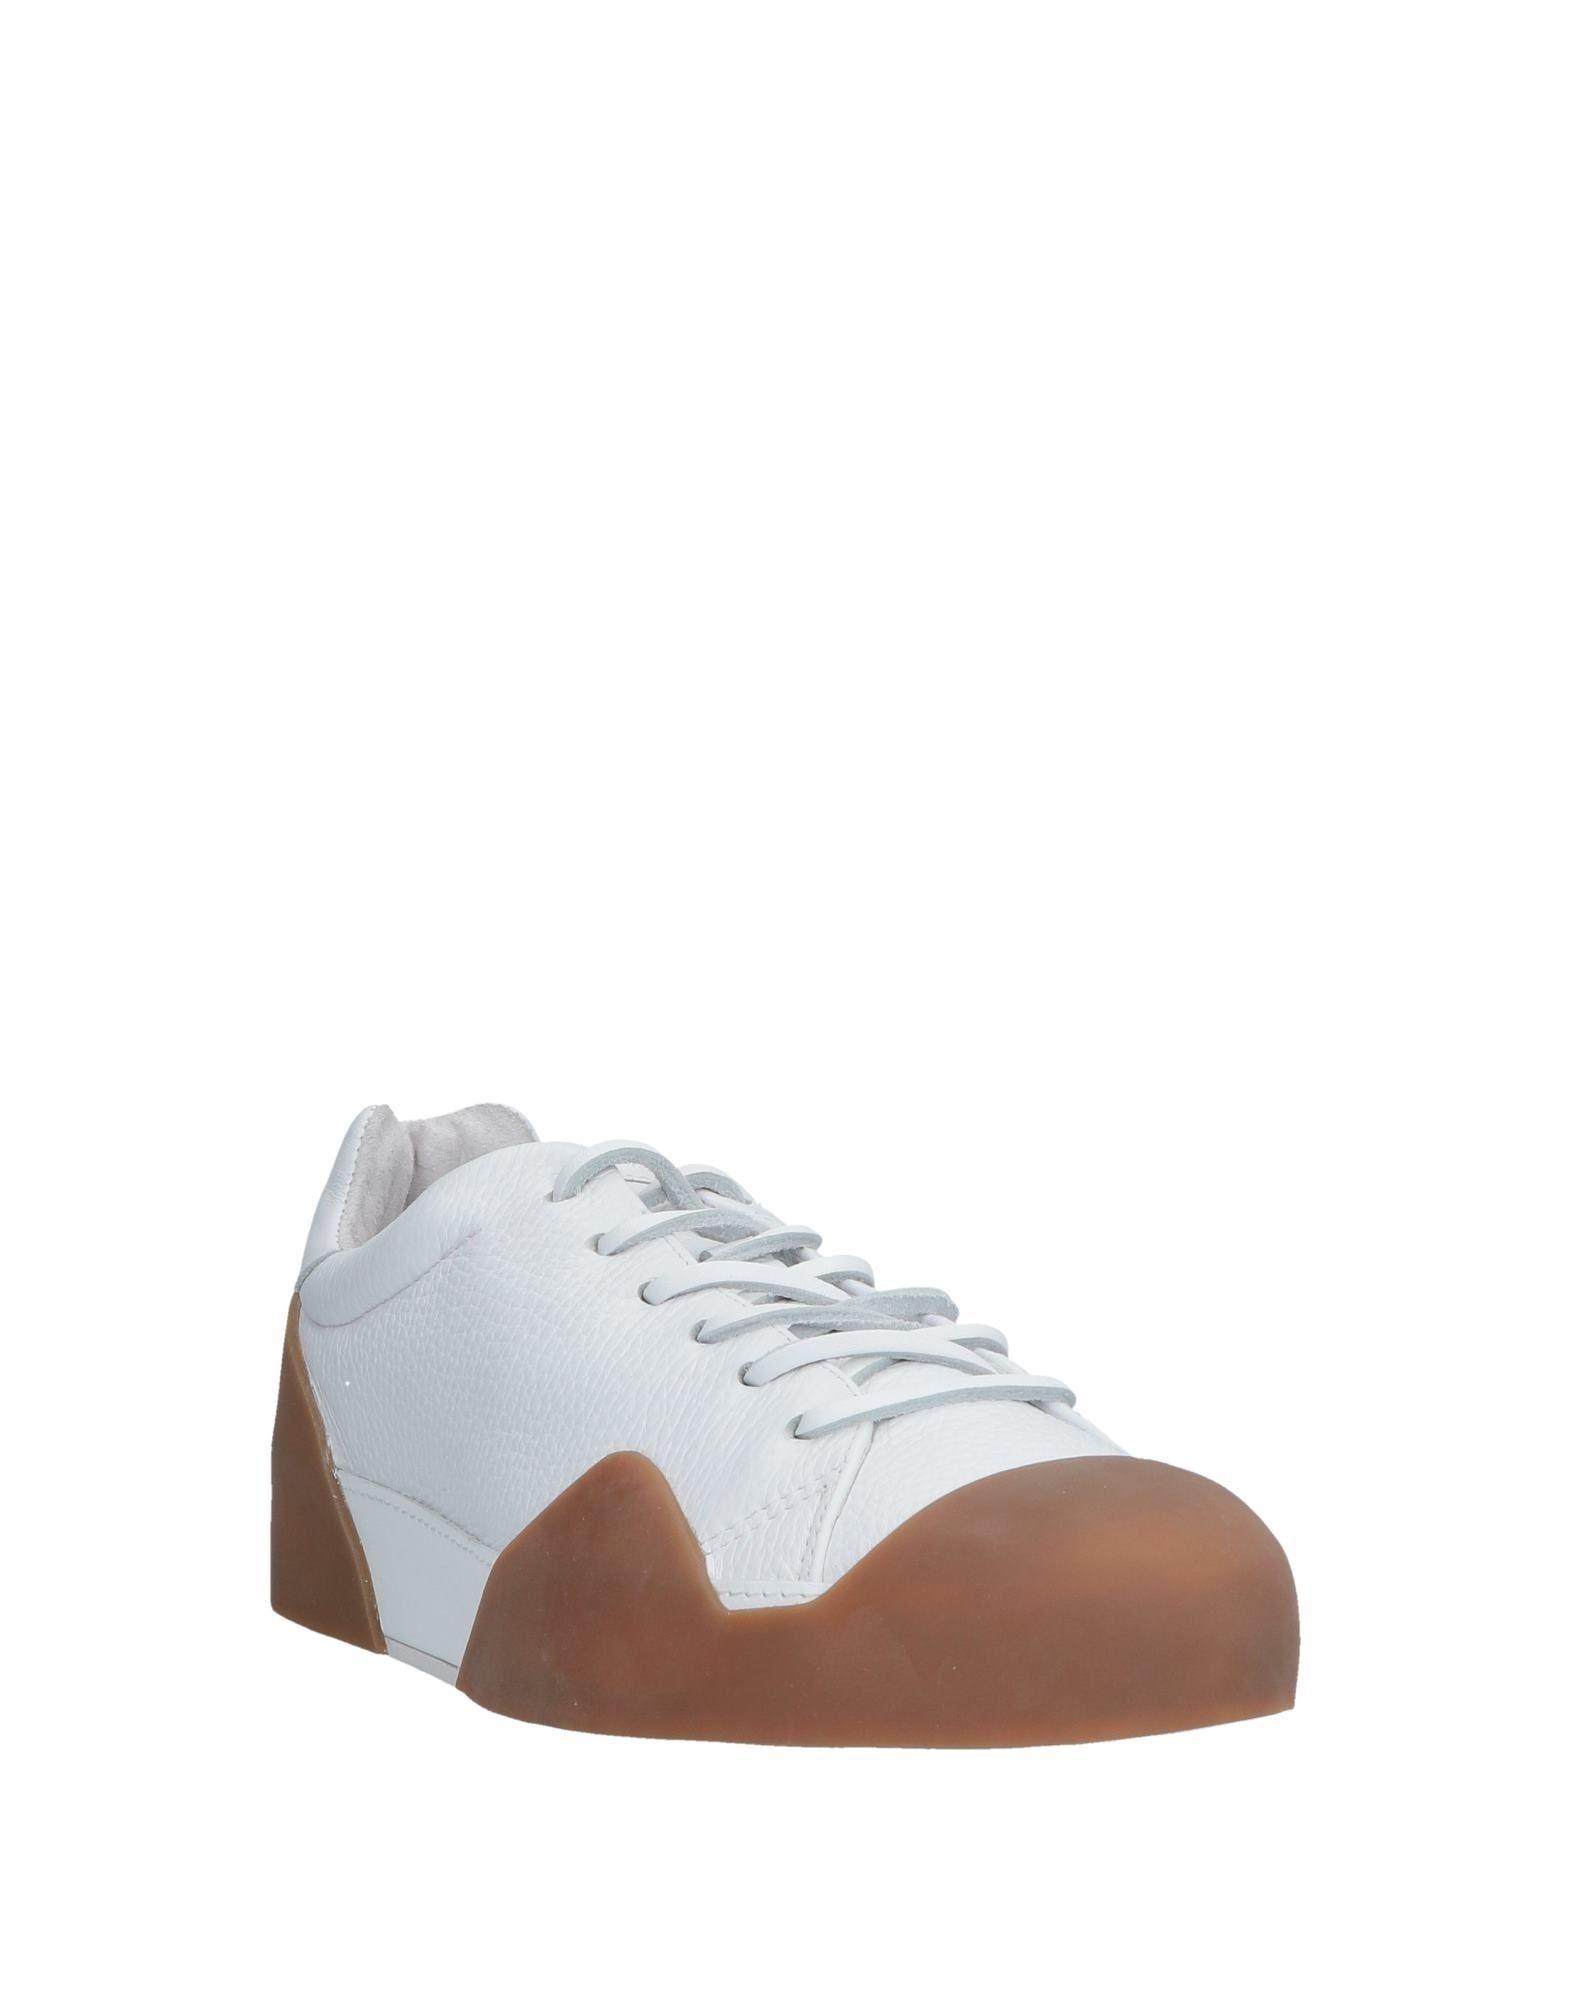 Rag & Bone Gute Sneakers Herren  11572485HW Gute Bone Qualität beliebte Schuhe 7fd911